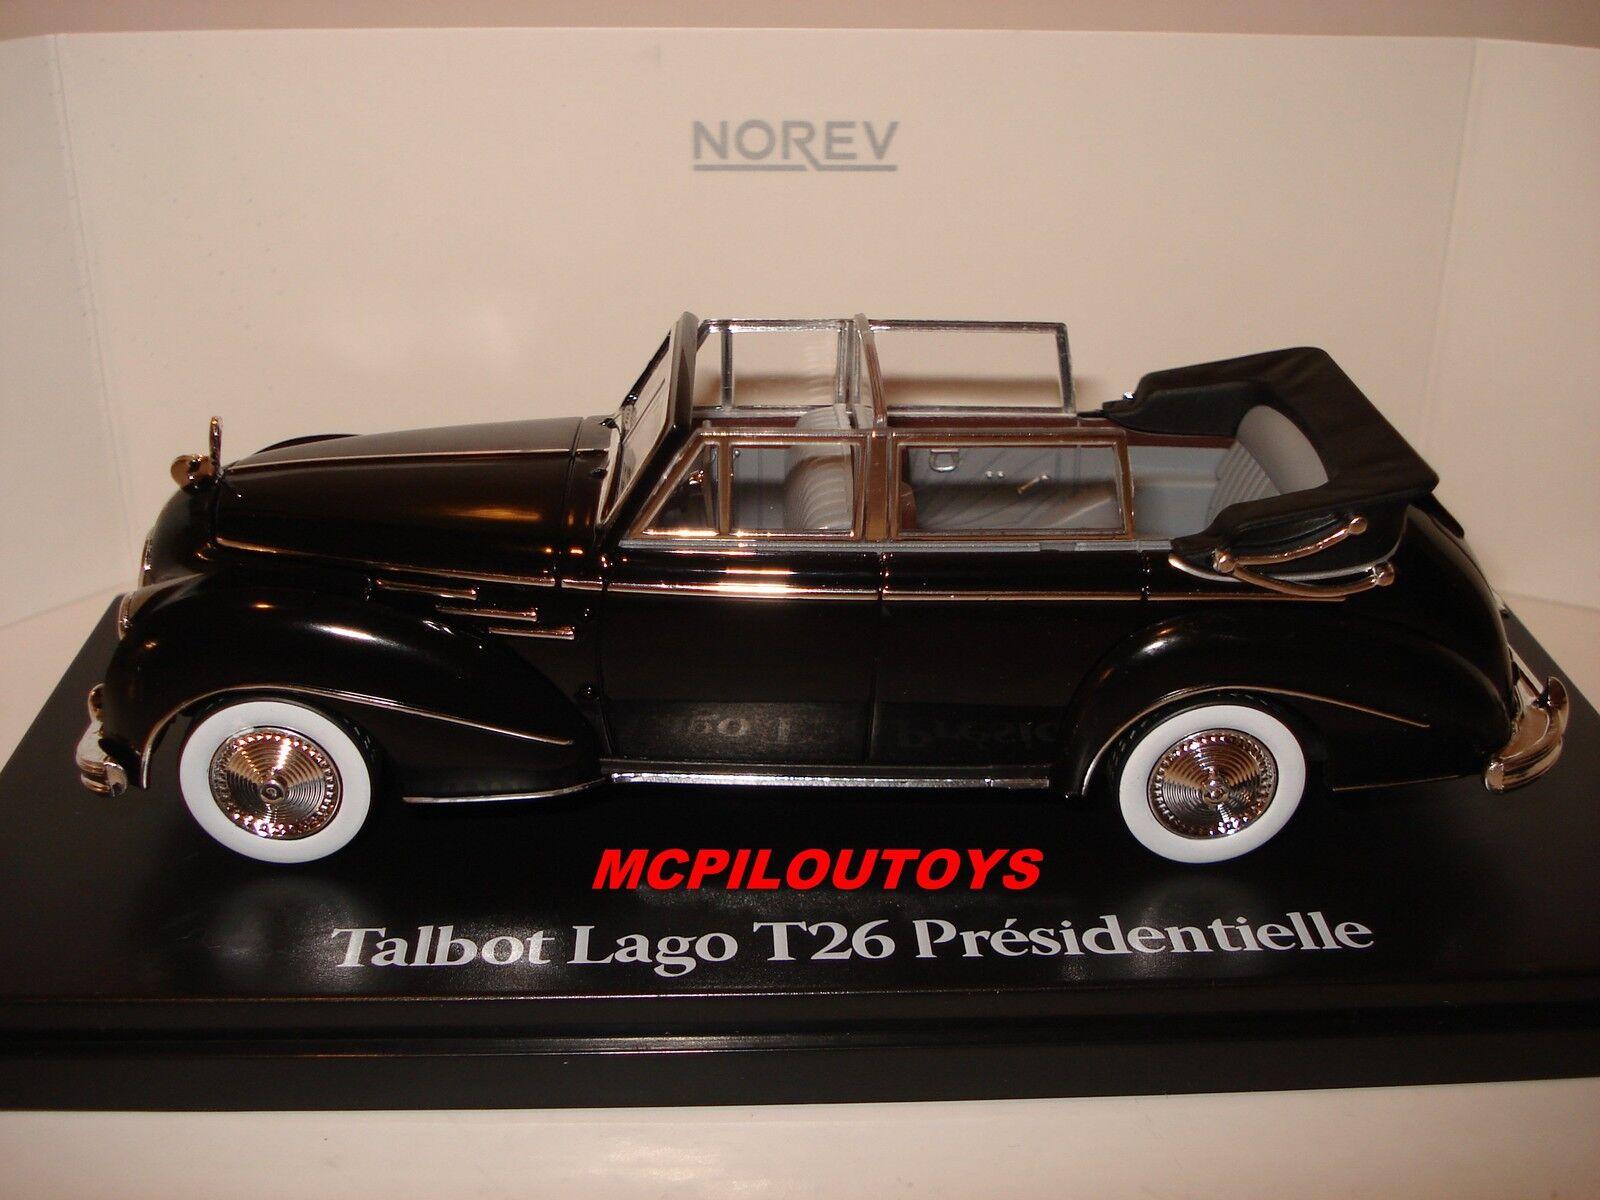 NOREV TALBOT LAGO T26  PRESIDENTIELLE VINCENT AURIOL 1950 1950 1950 au 1 43° 98dab8